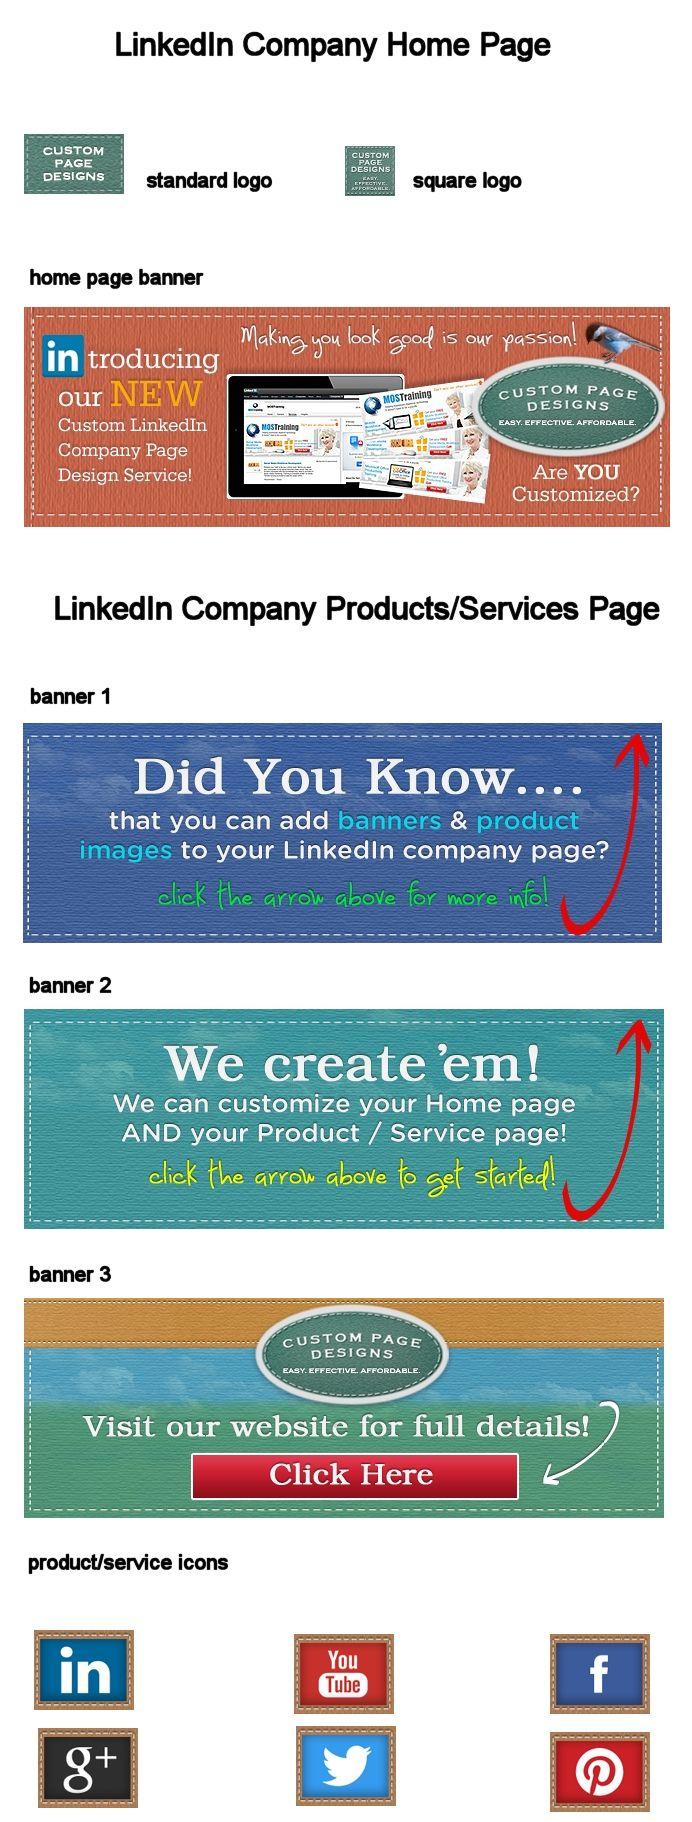 how to add logo to linkedin company